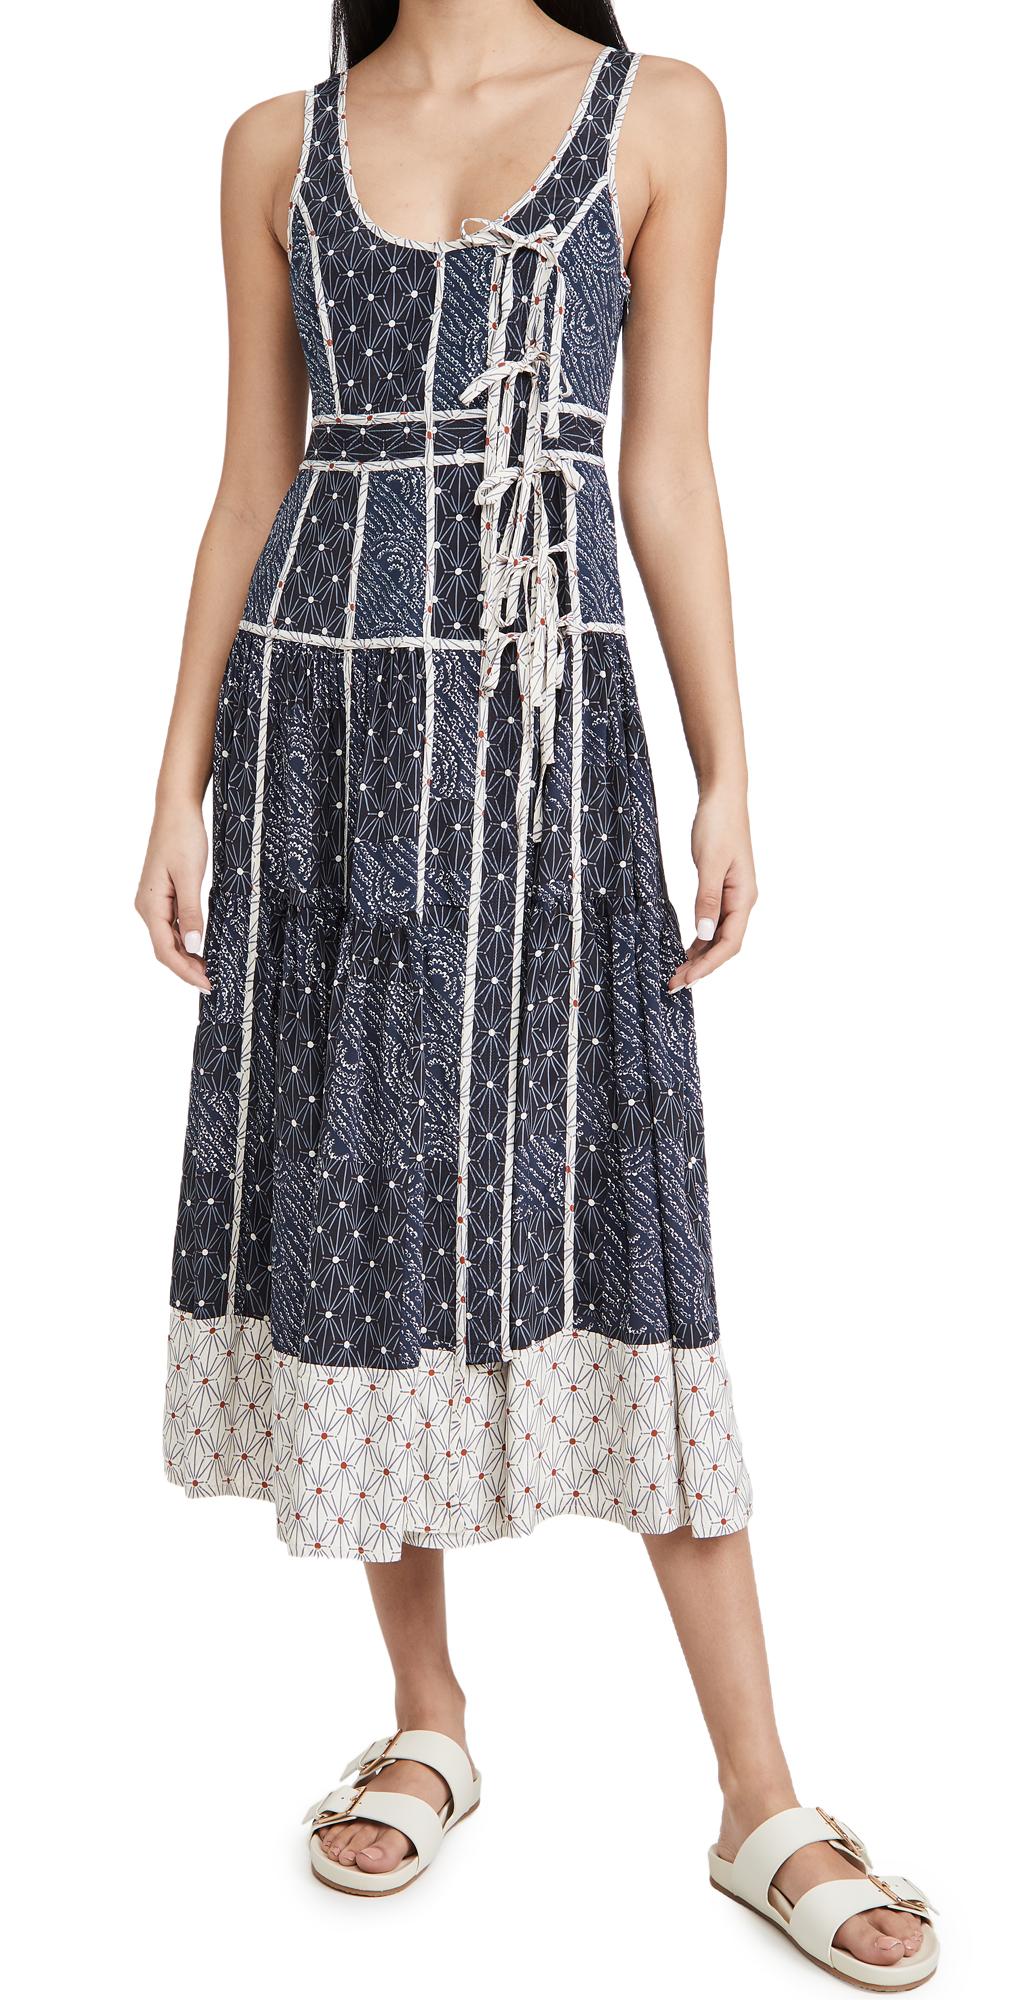 Ulla Johnson Keira Dress